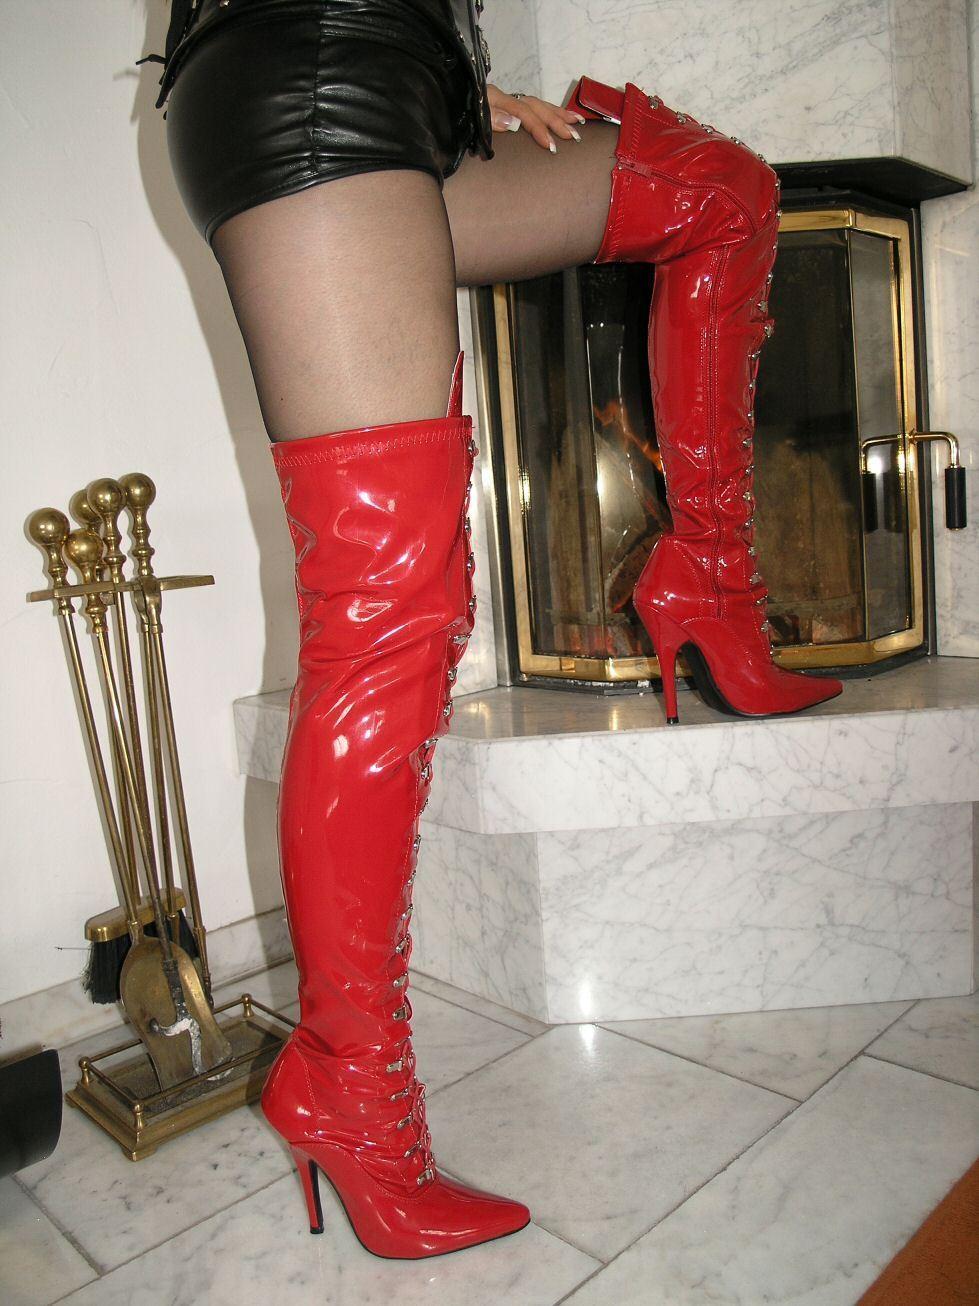 Vernis stiletto High Heels Bottes Overknee rouge 46 stiletto paragraphe Lacets